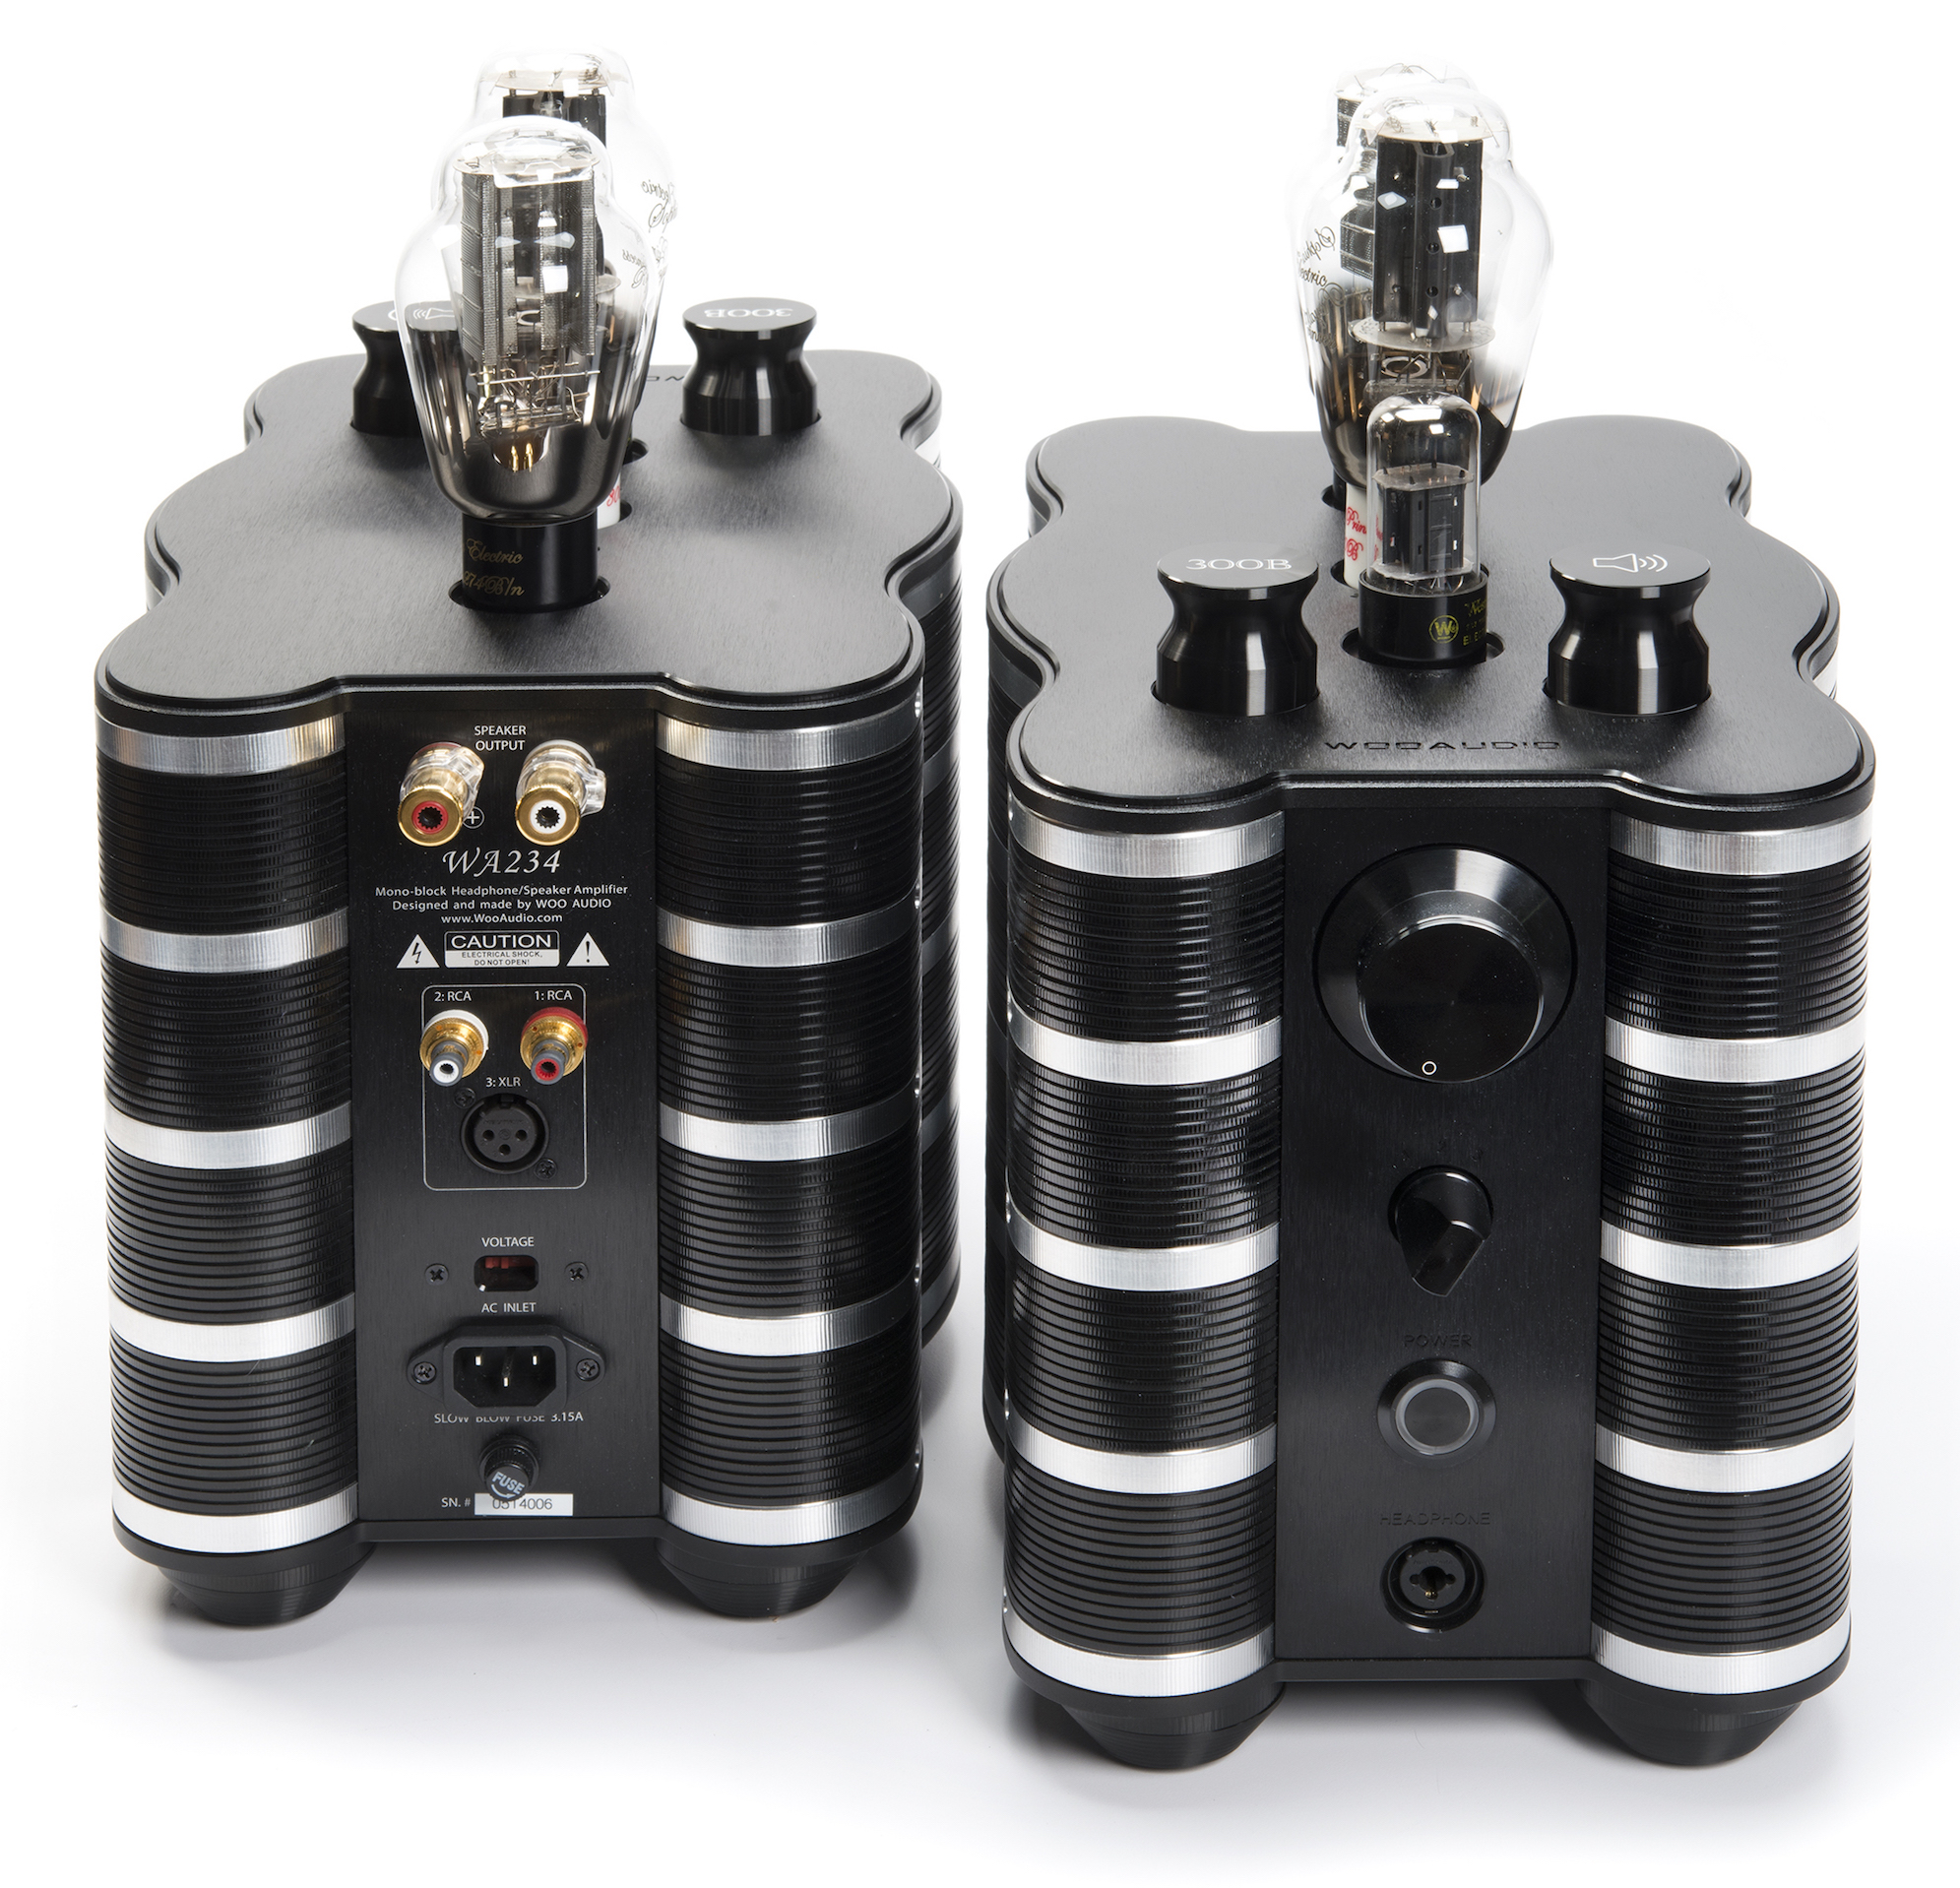 woo-audio-wa234mono-headphone-amplifier-black-front-highend-audiophile-vacuum-tube-headfi-300b-6sn7-274b-5u4g-tubes-preamplifier-powerful-amp